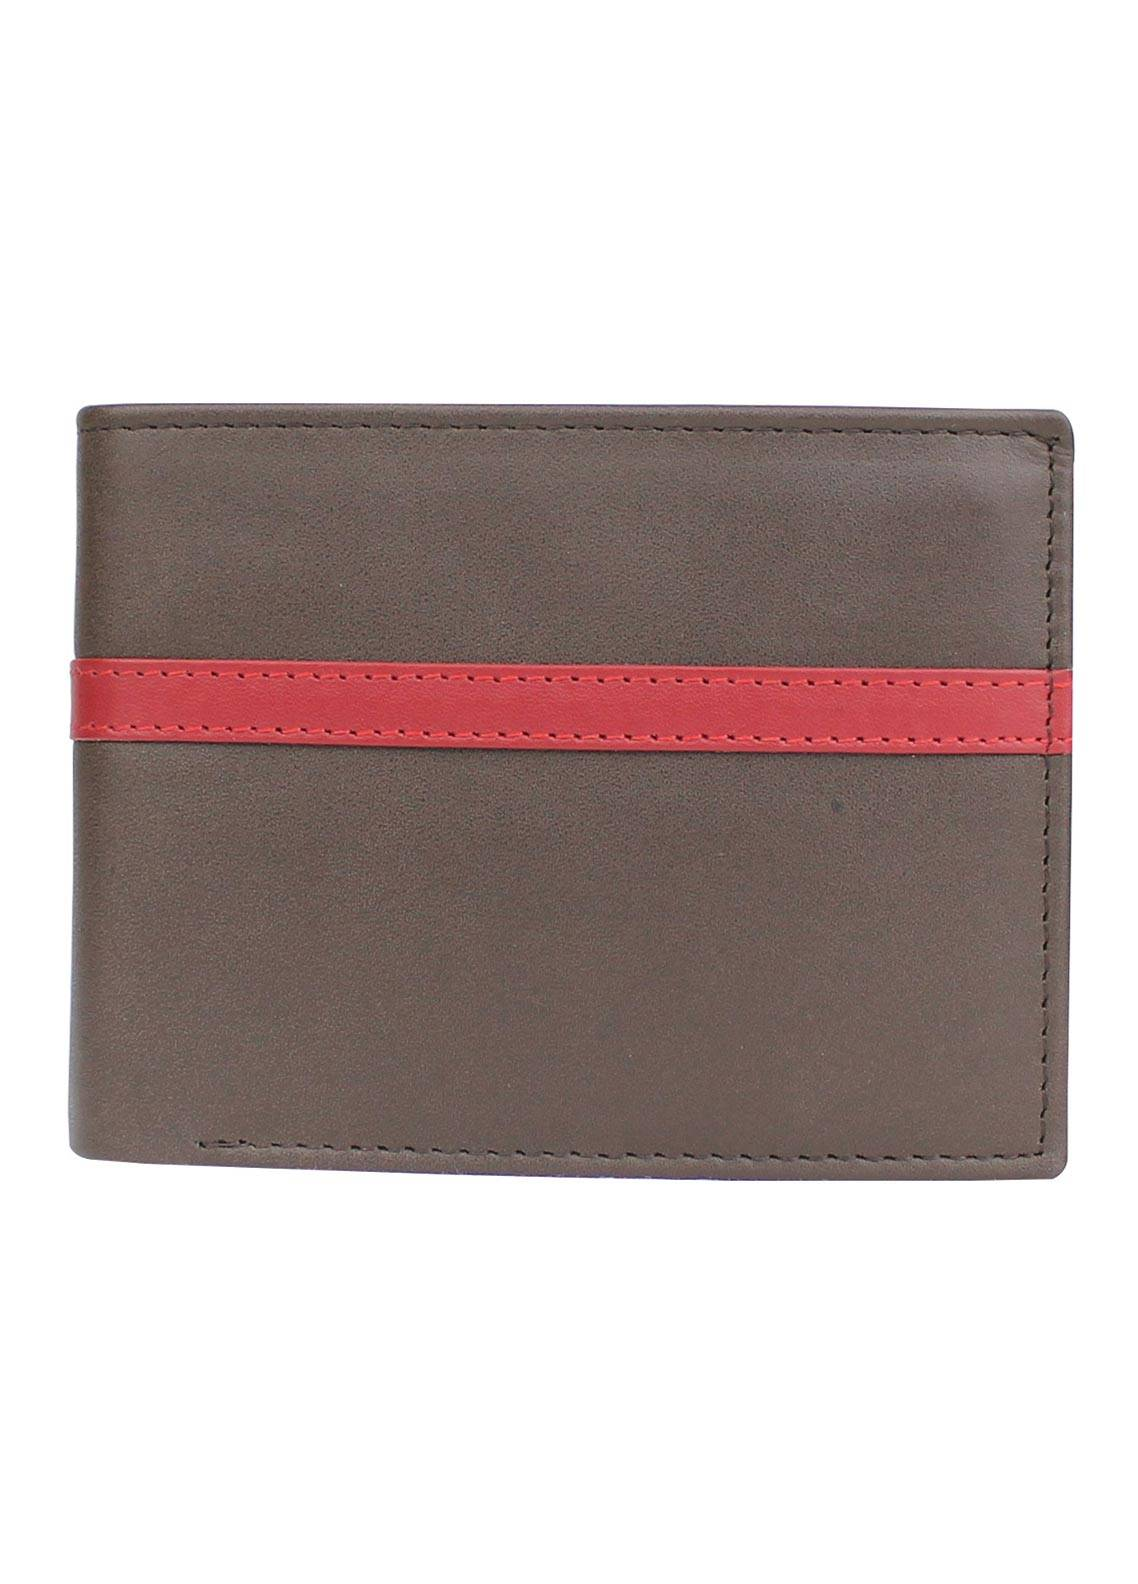 Shahzeb Saeed Plain Texture Leather  Wallet W-080 - Men's Accessories